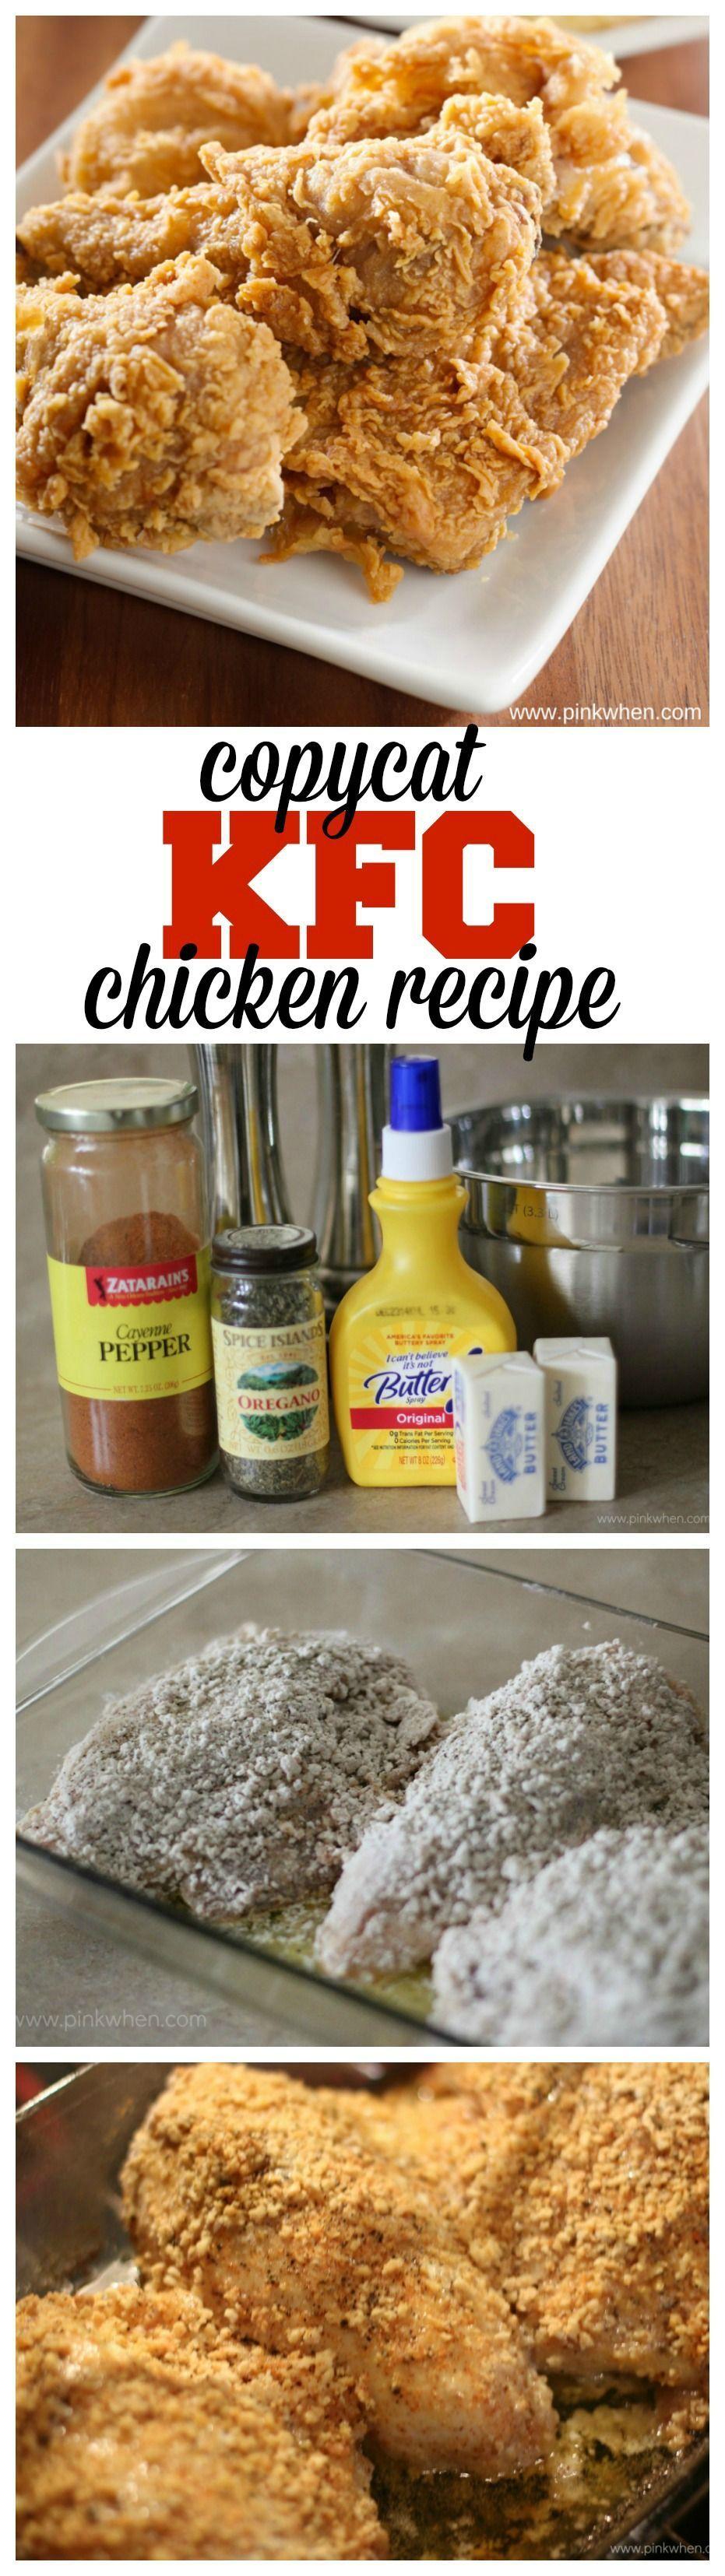 flirting meme with bread recipe like chicken recipe